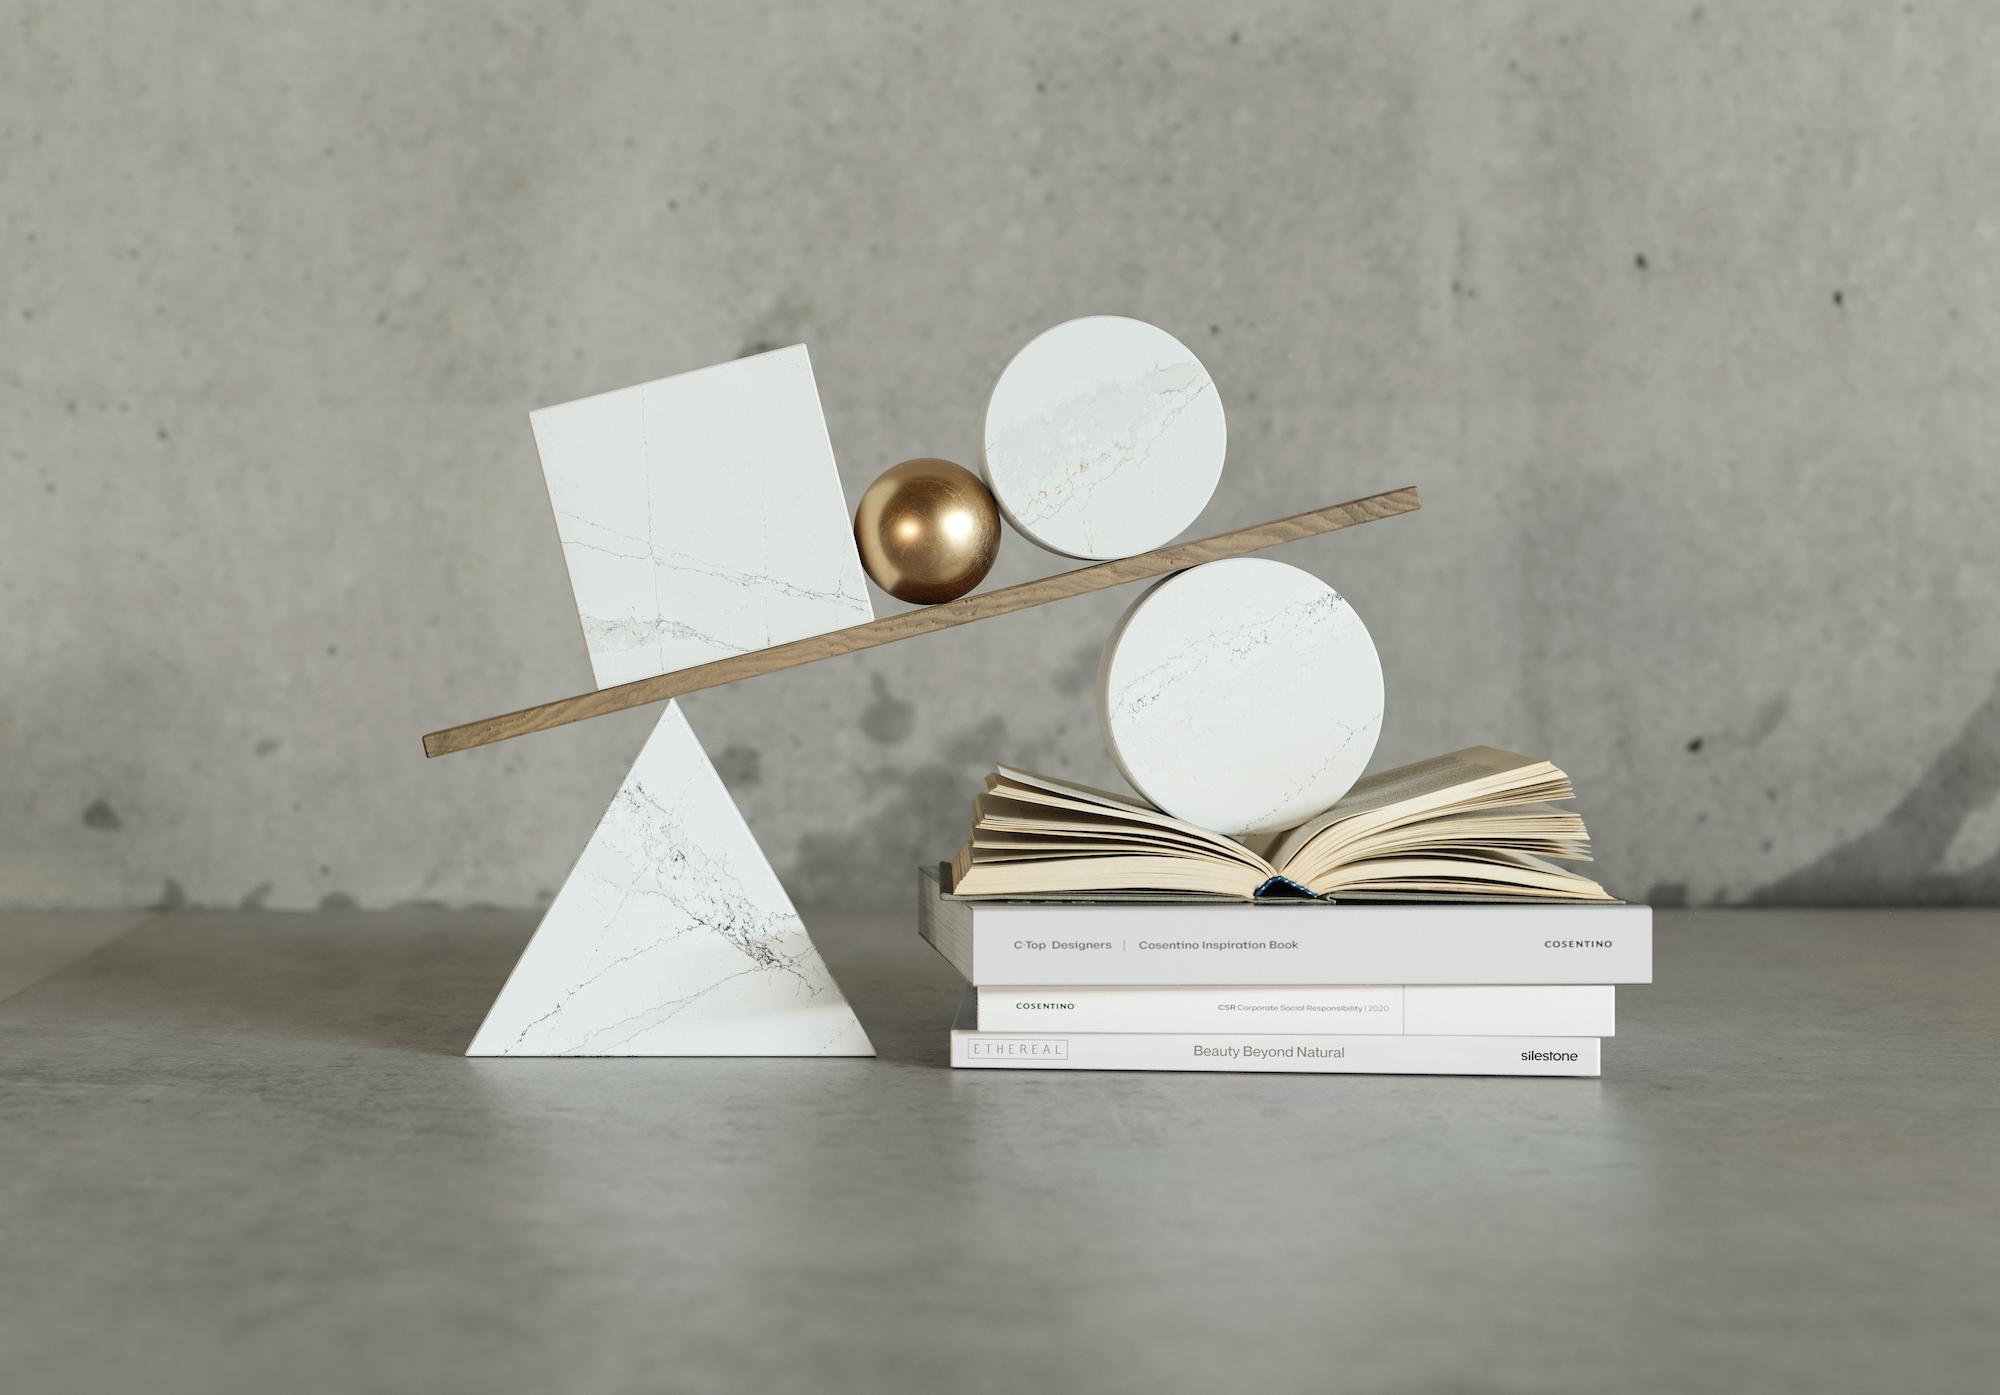 Image of Bodegon Ethereal Encuadrado in Silestone® lance la nouvelle collection durable Ethereal, inspirée du magnifique marbre naturel - Cosentino